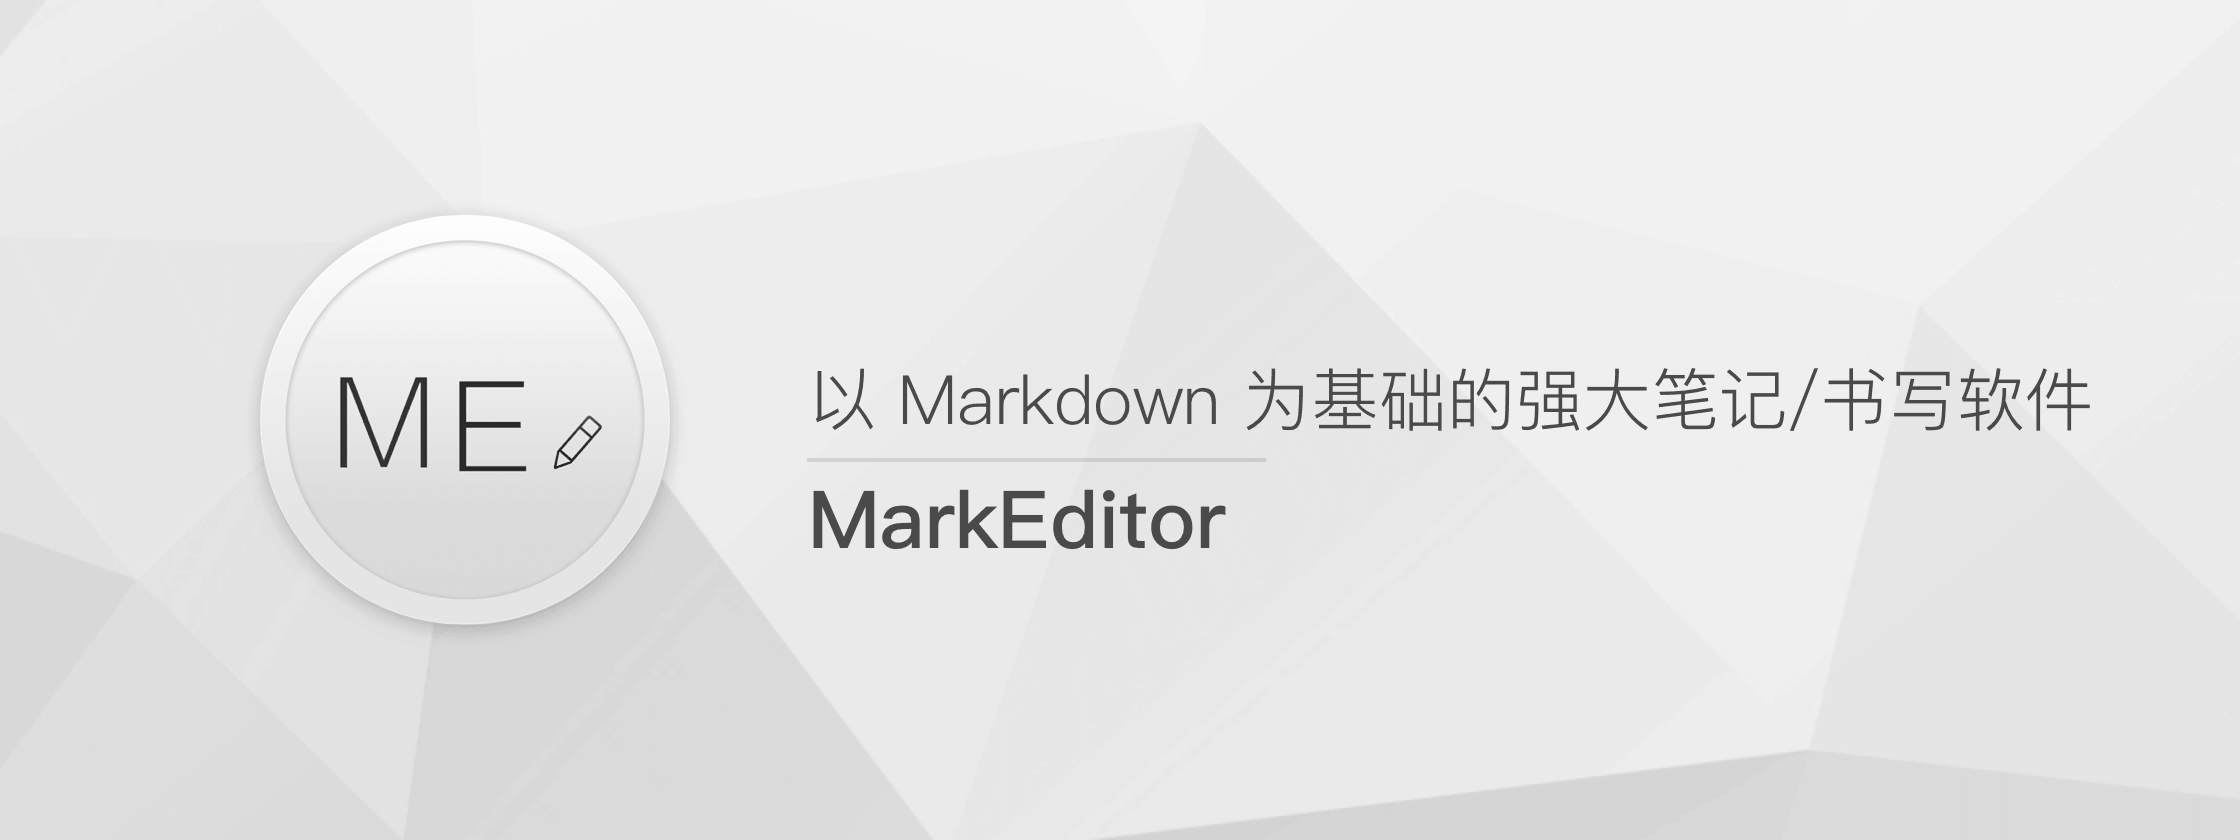 MarkEditor – 以 Markdown 为基础的强大笔记 / 书写软件